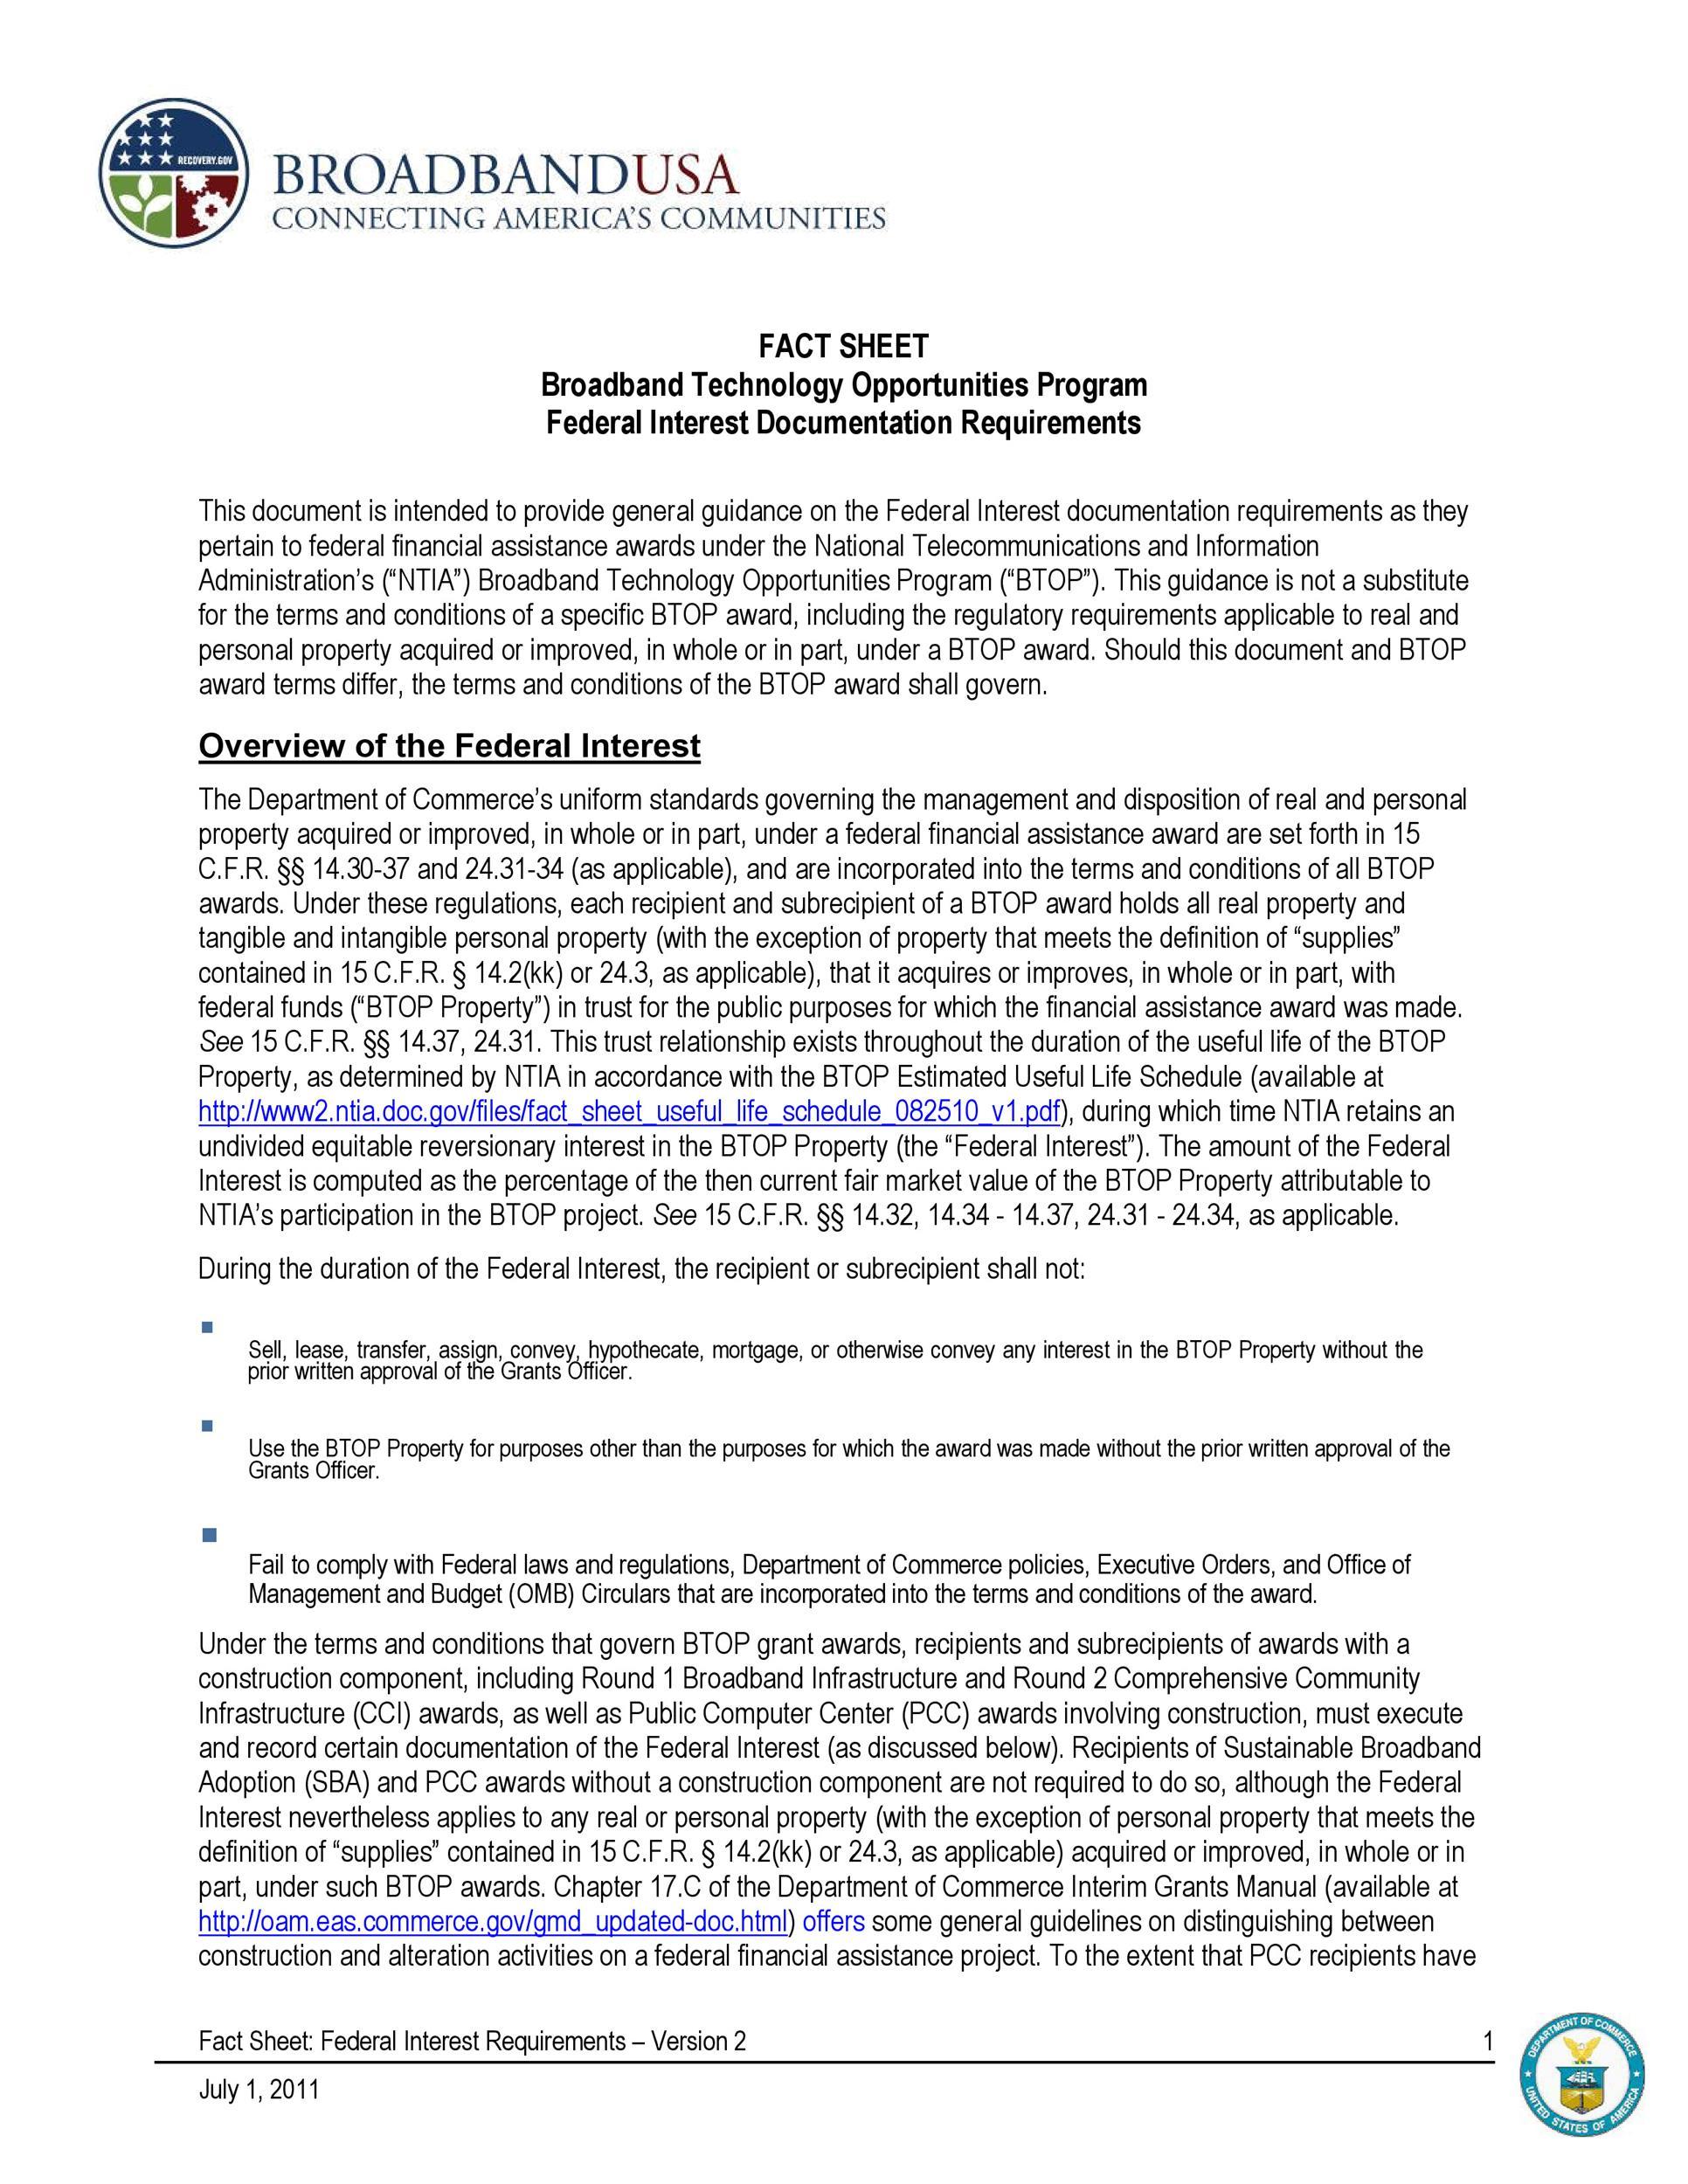 Free Fact sheet Template 16